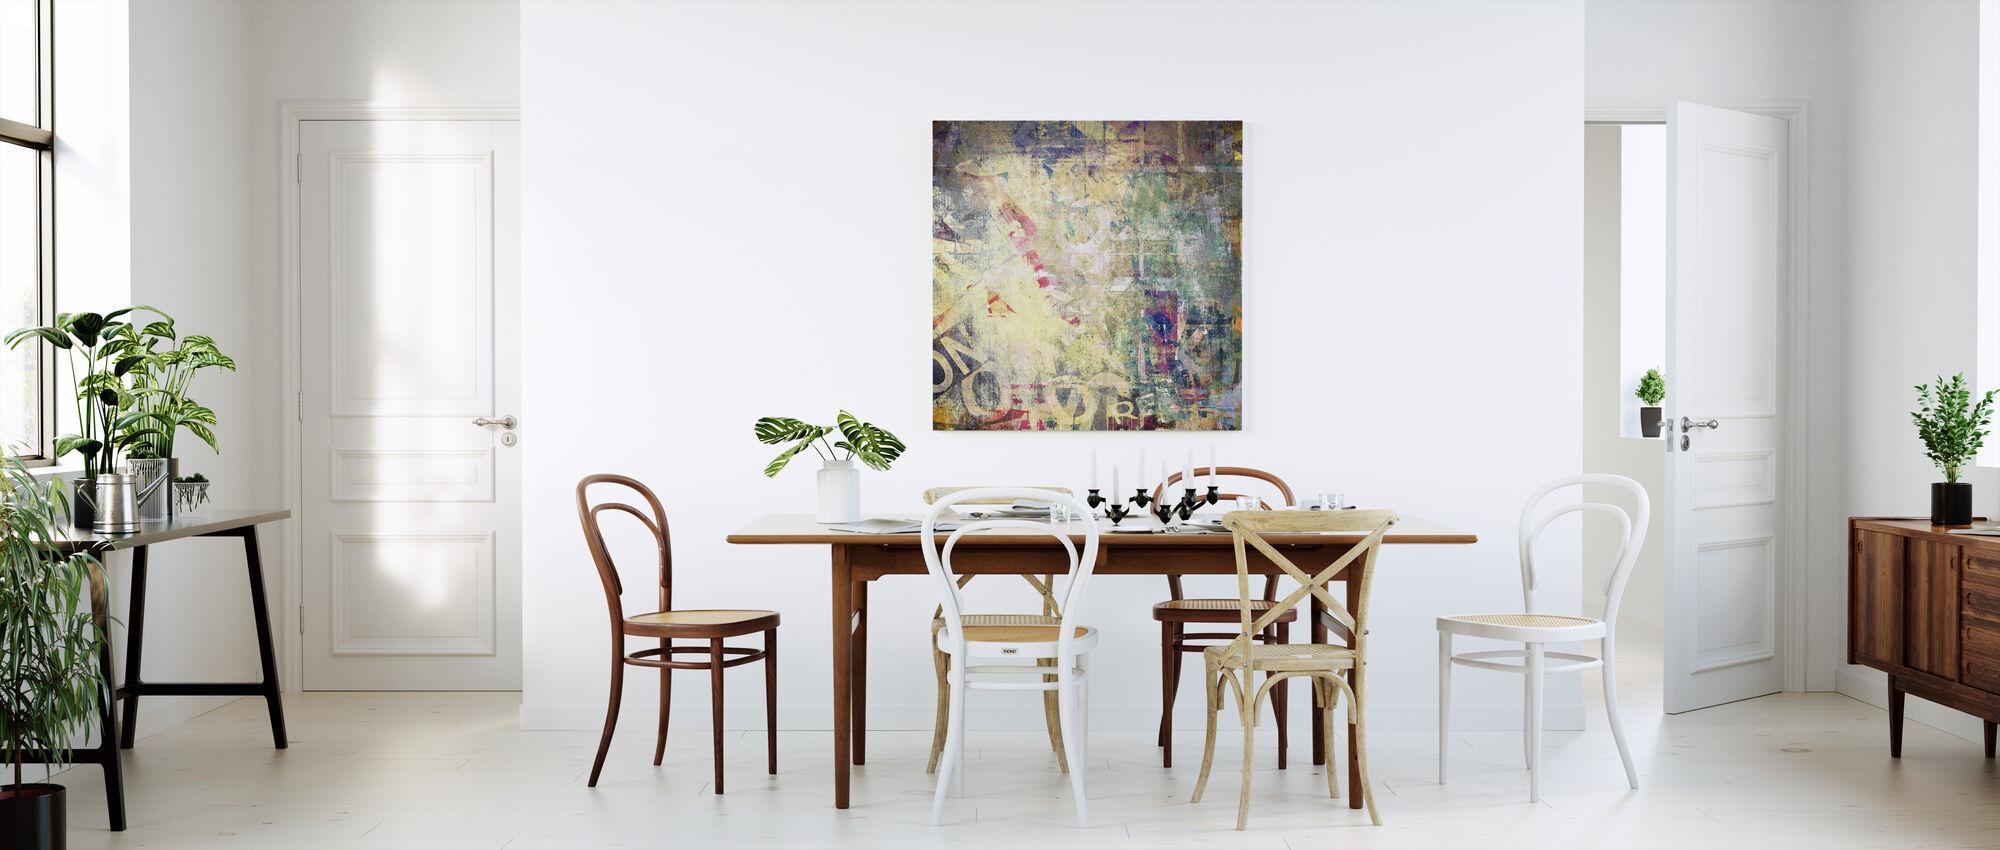 Scherpe kleur textuur - Canvas print - Keuken